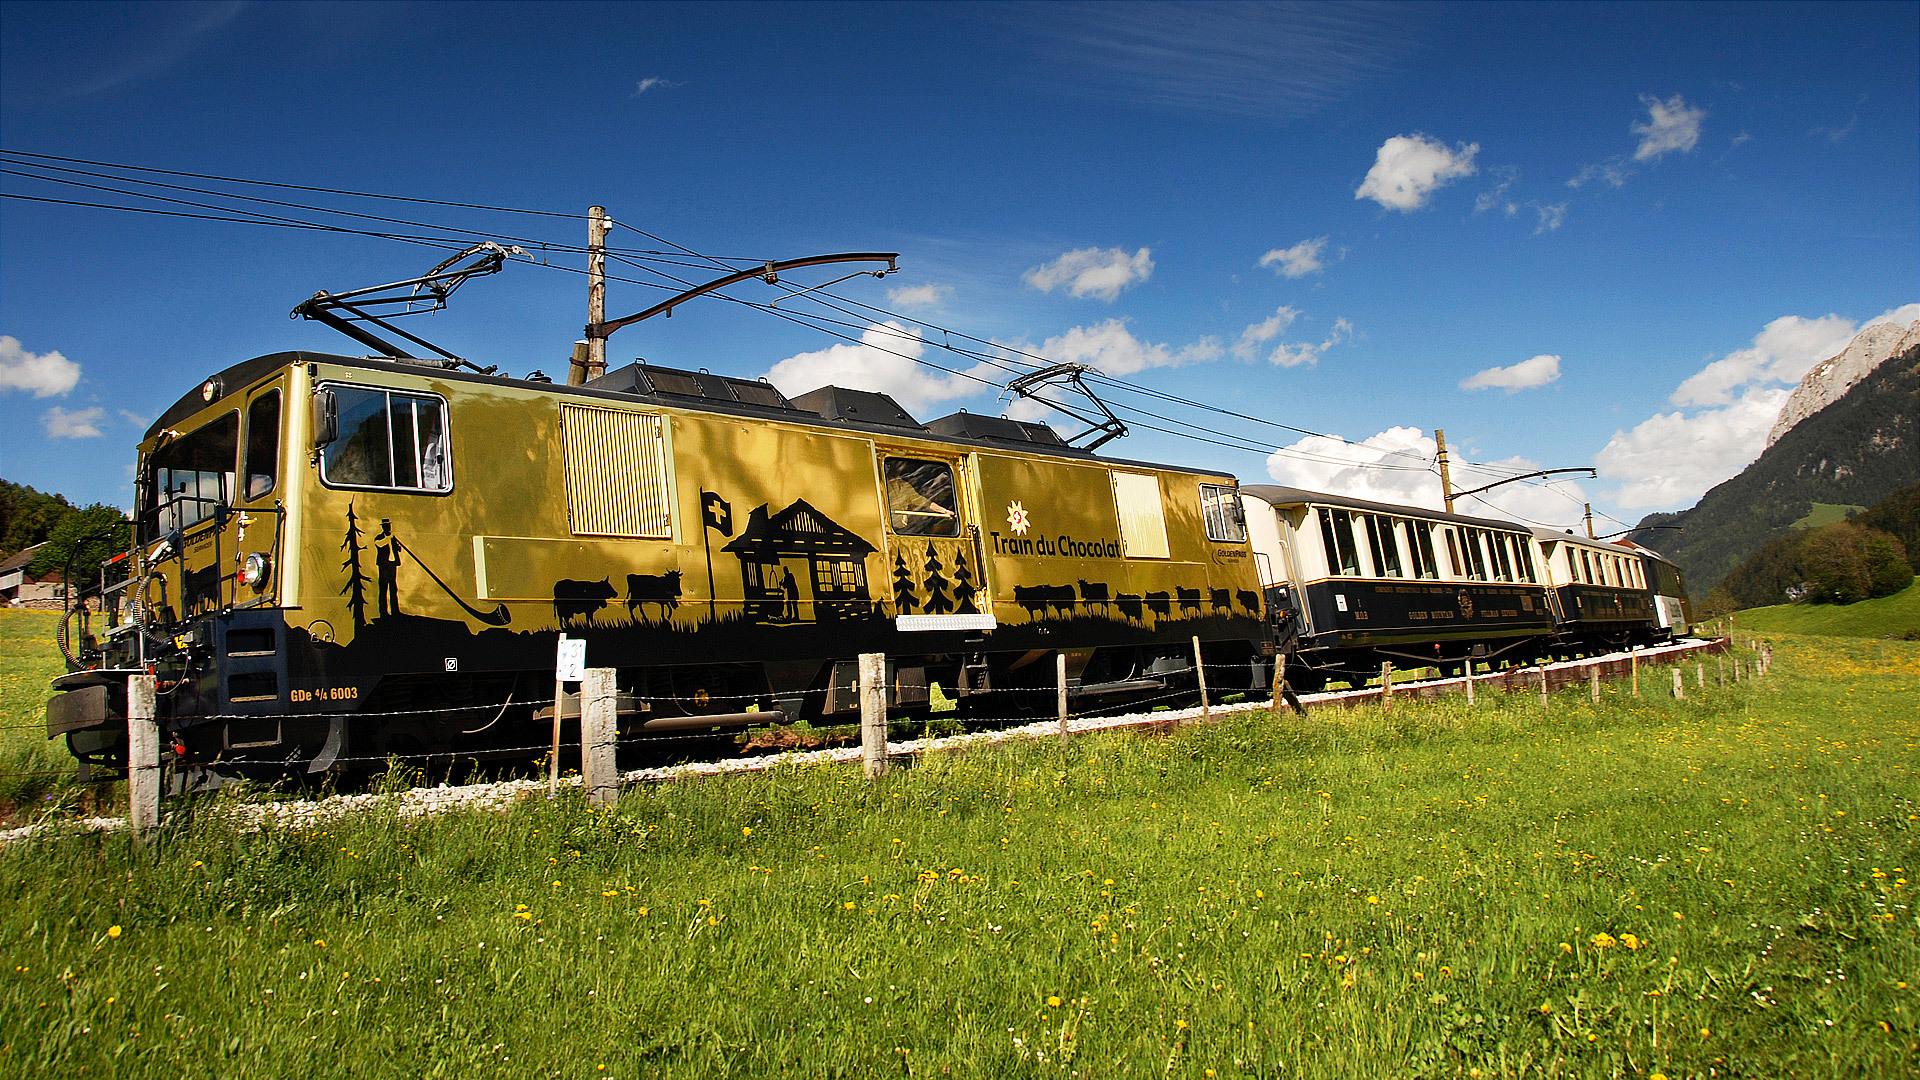 The Chocolate Train